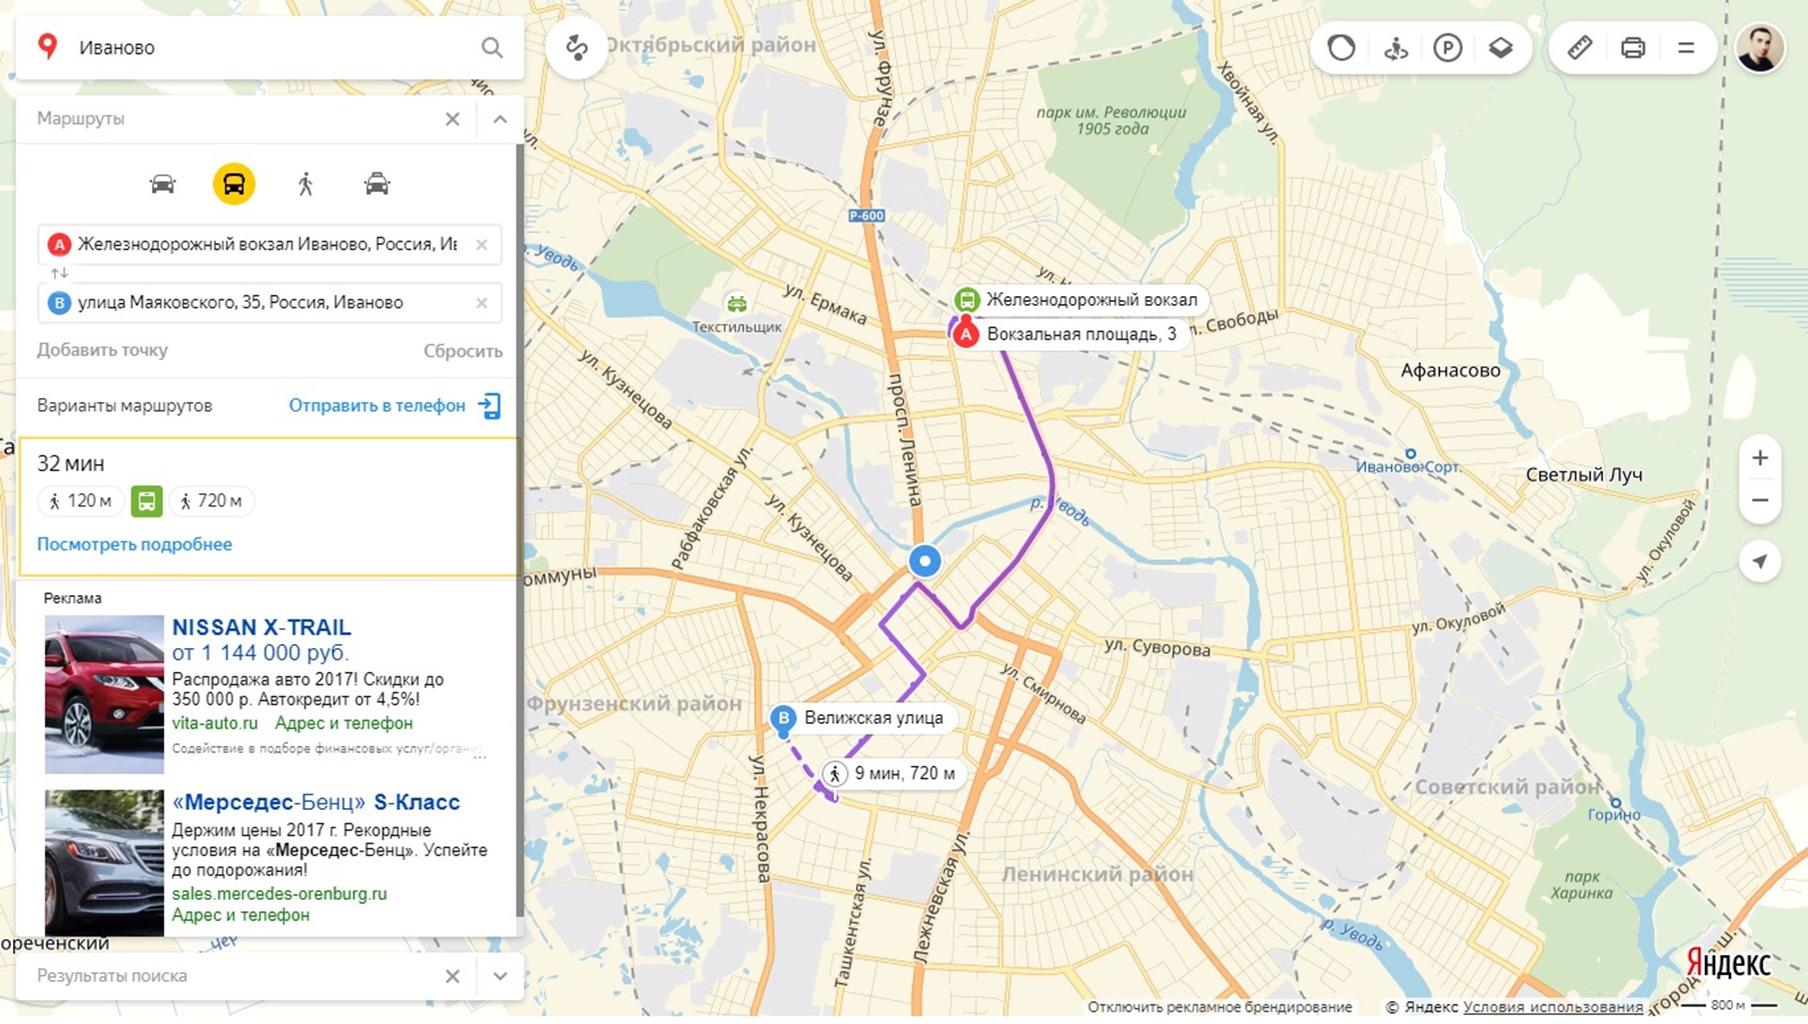 yandex.maps.ivanovo